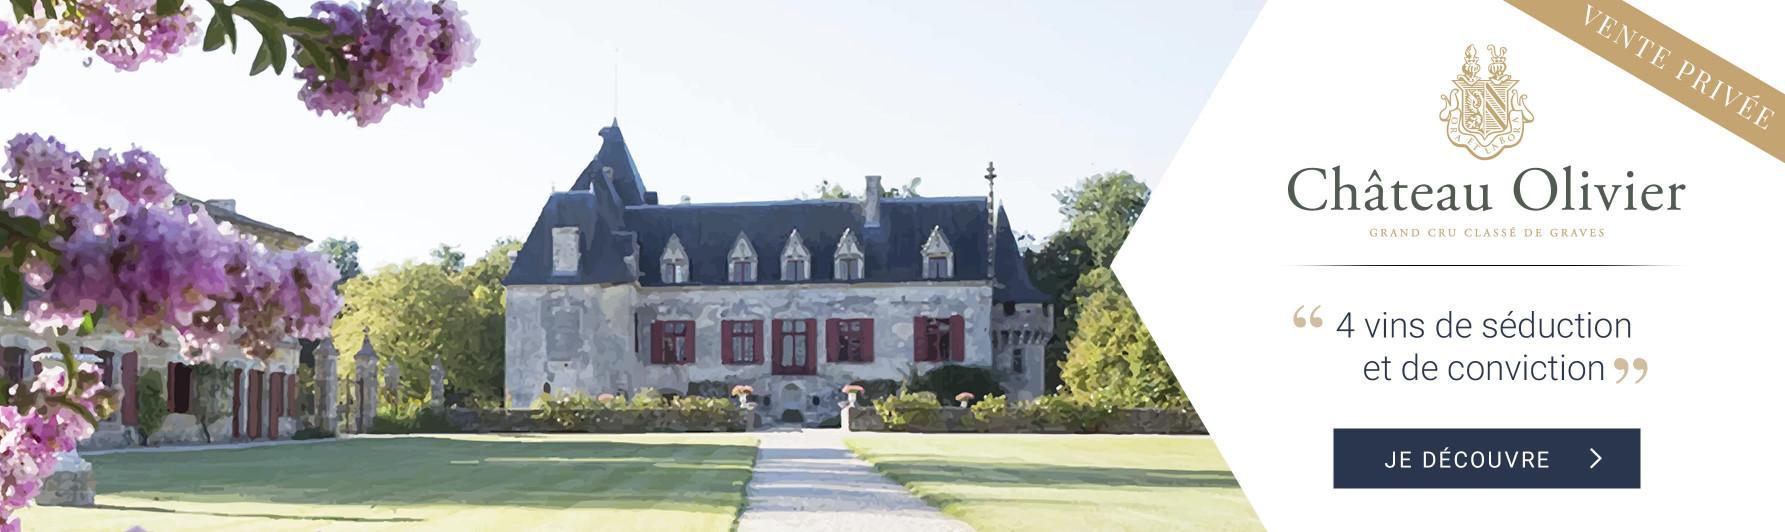 Château Olivier - Vente privée